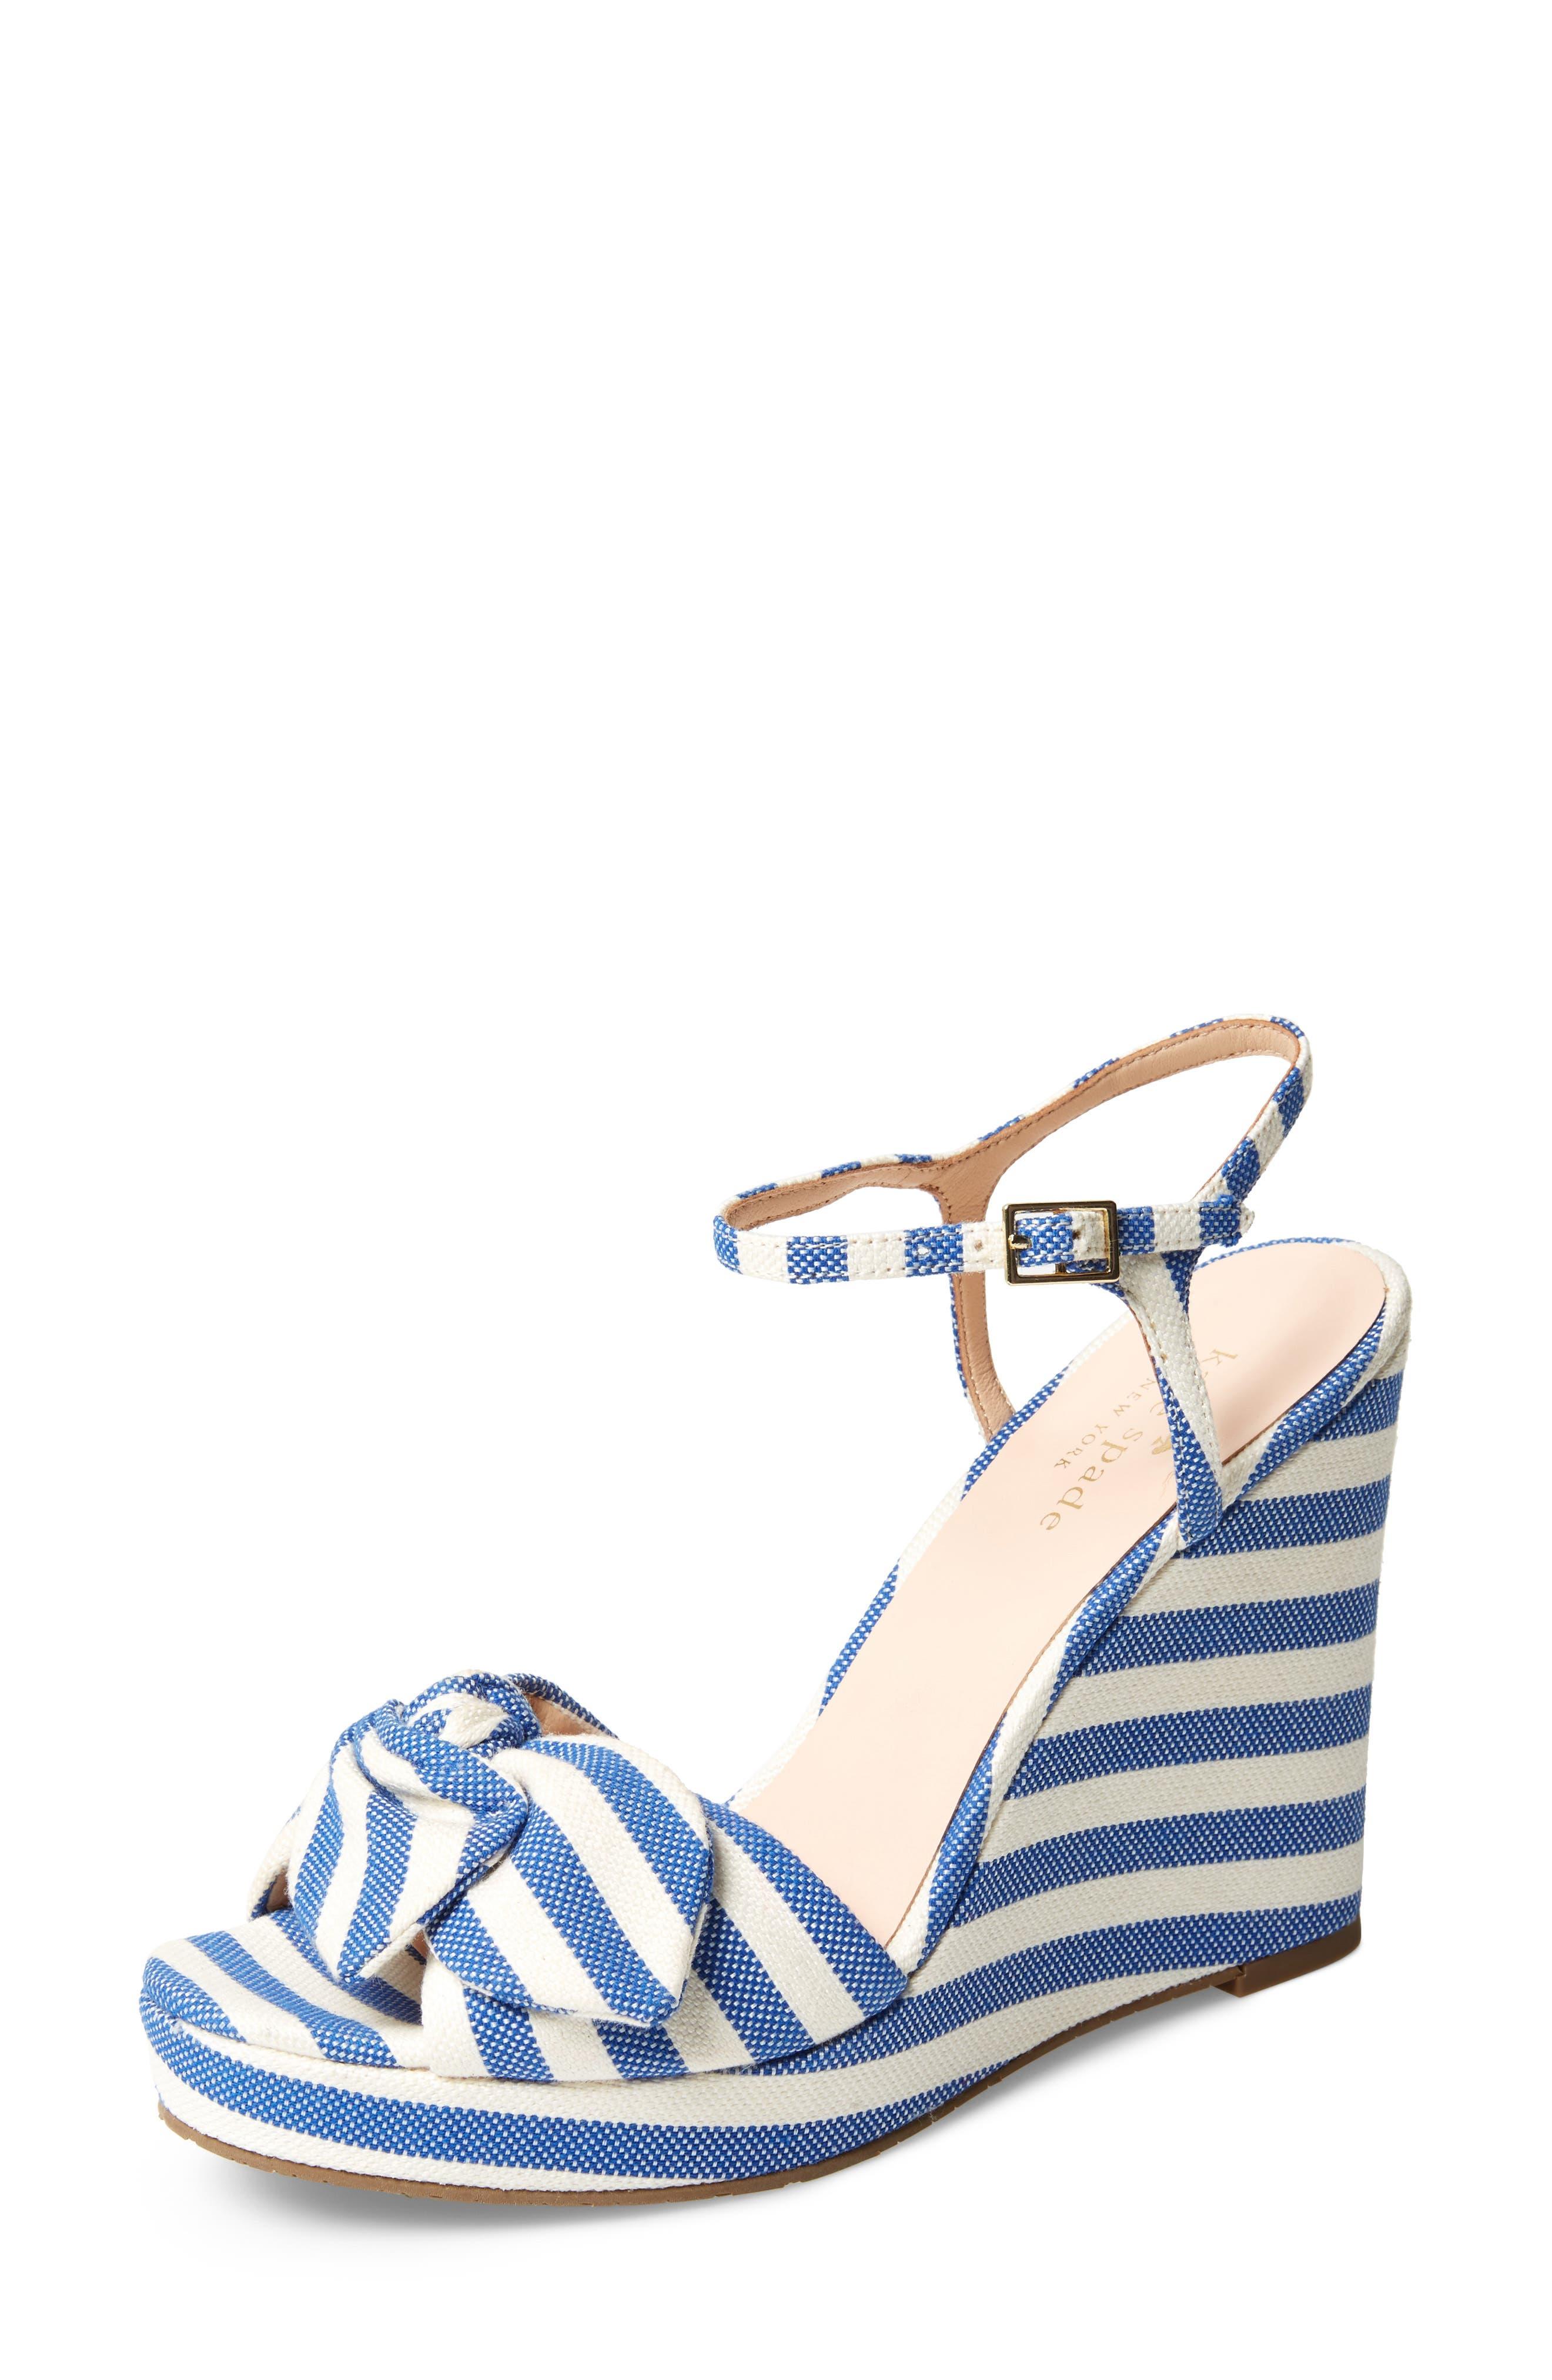 janae knot platform wedge sandal,                         Main,                         color, BLUE/CREAM STRIPE